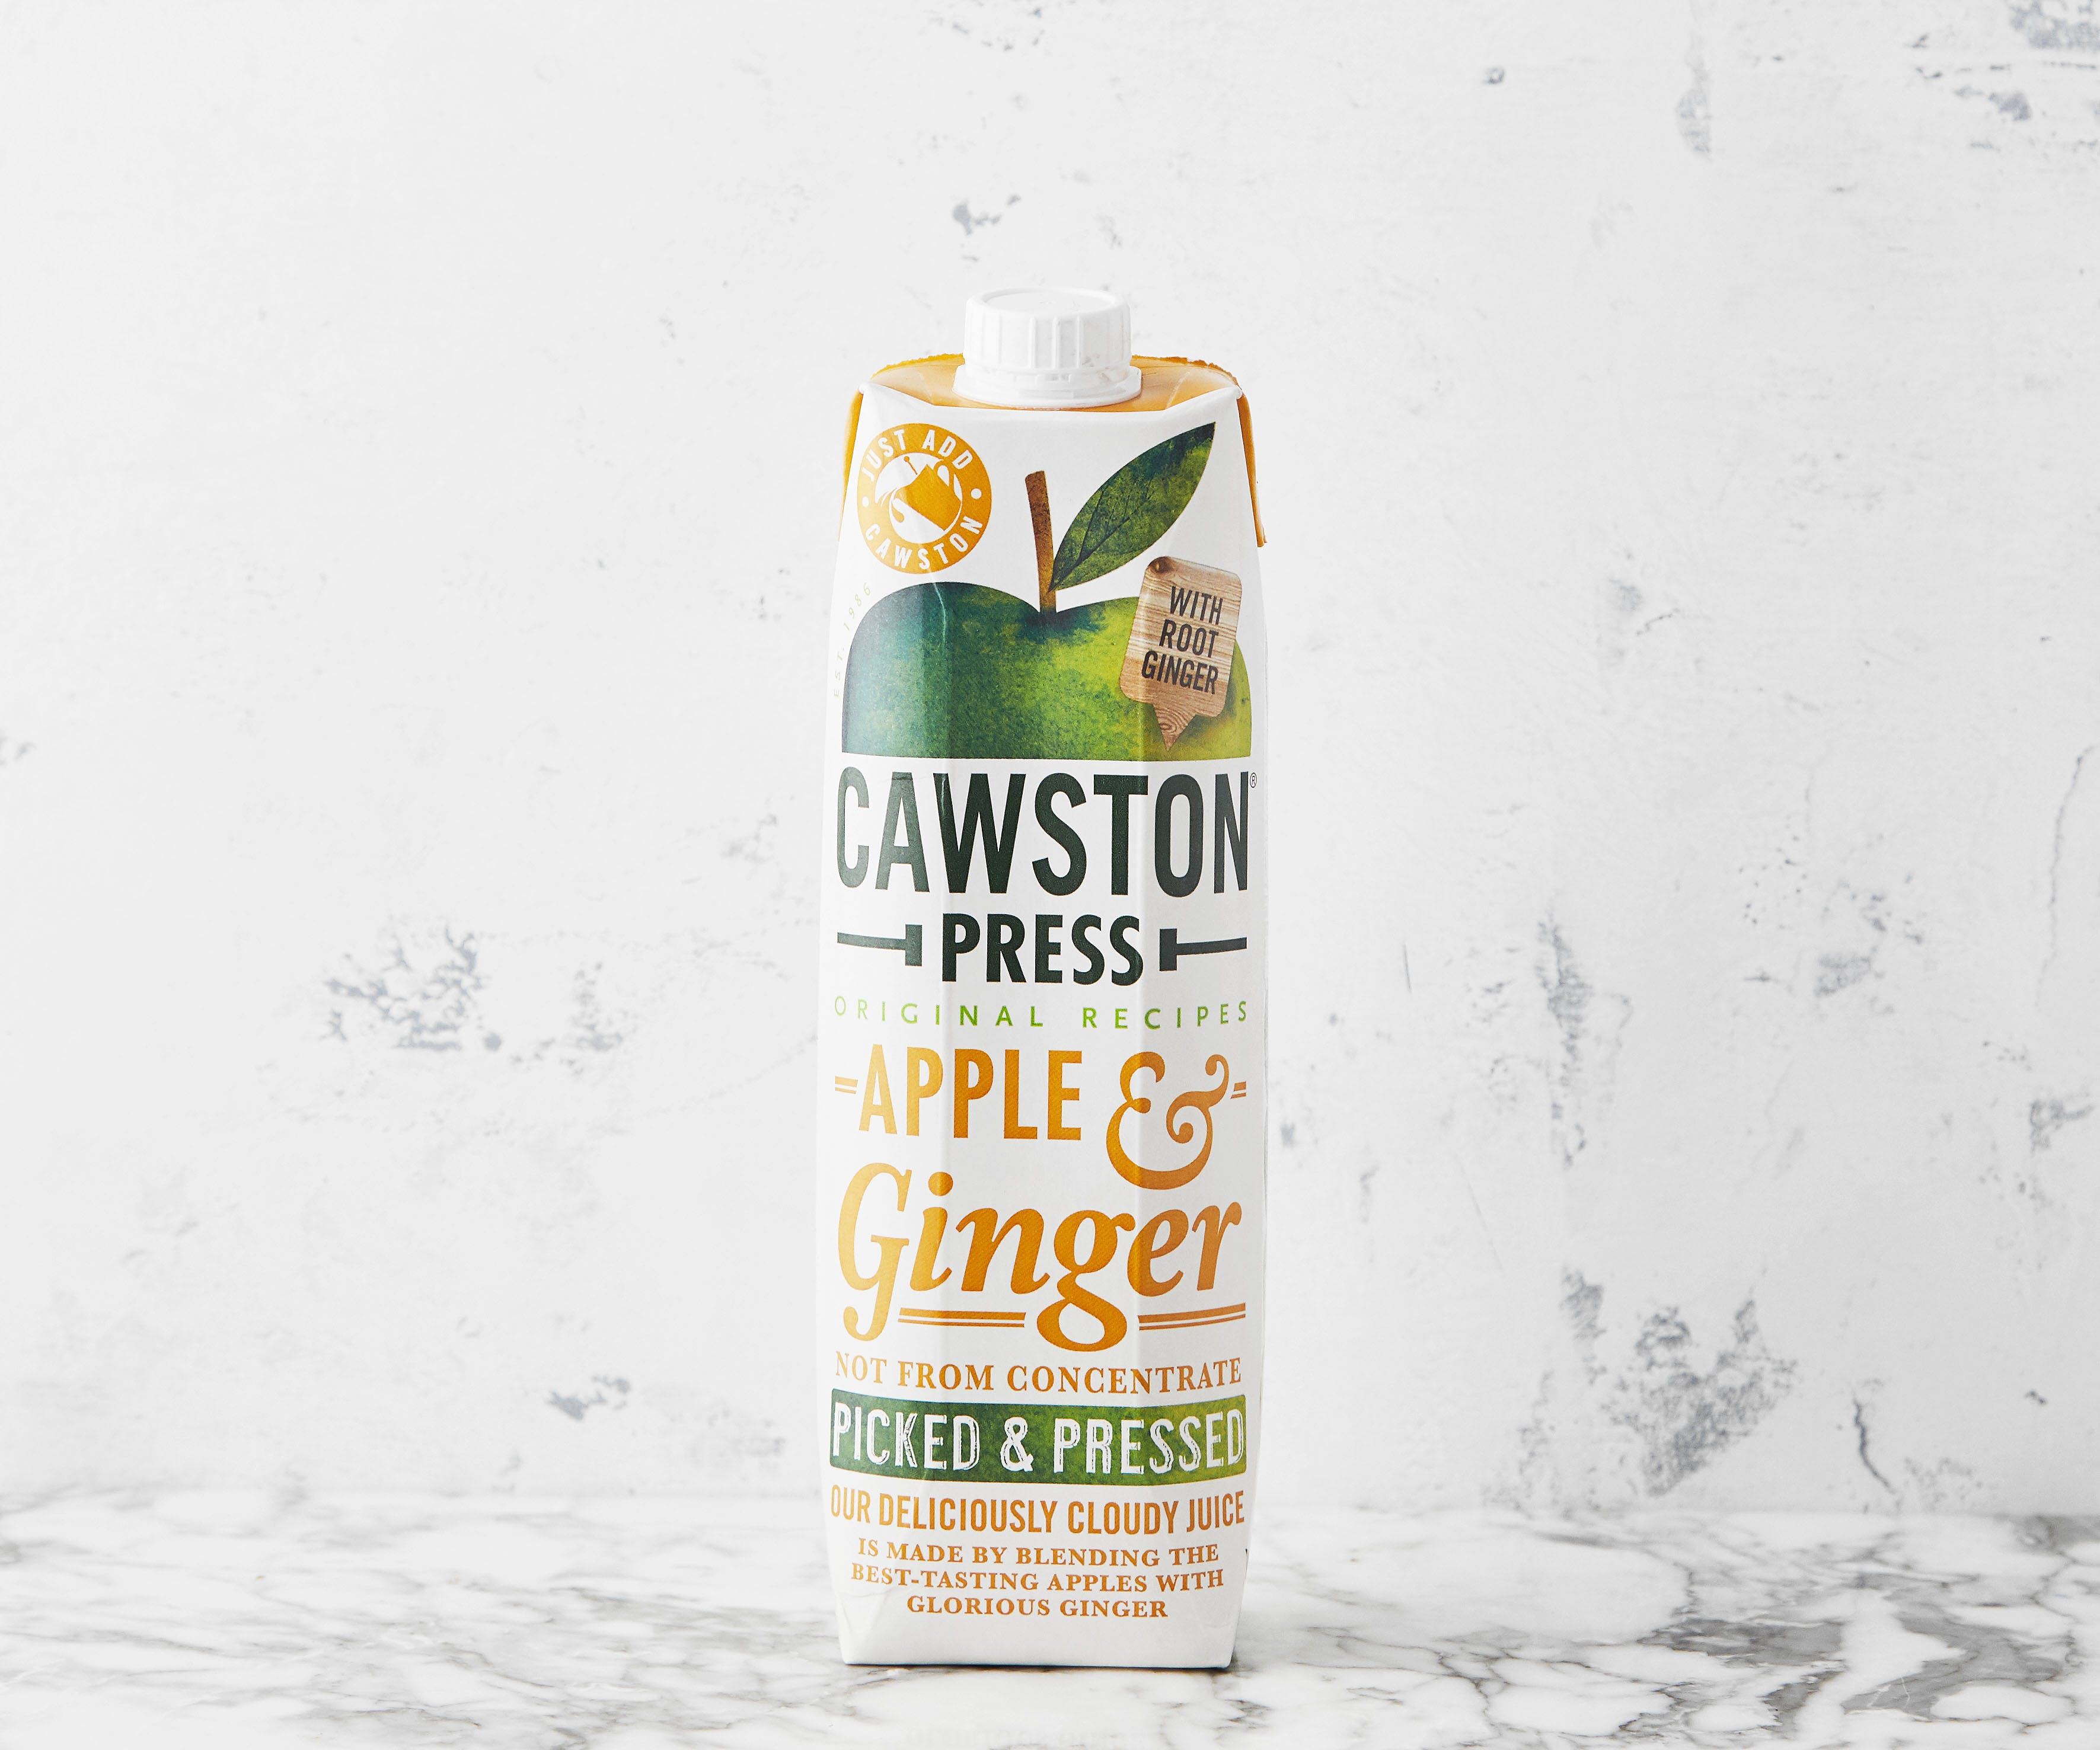 Apple & Ginger Juice